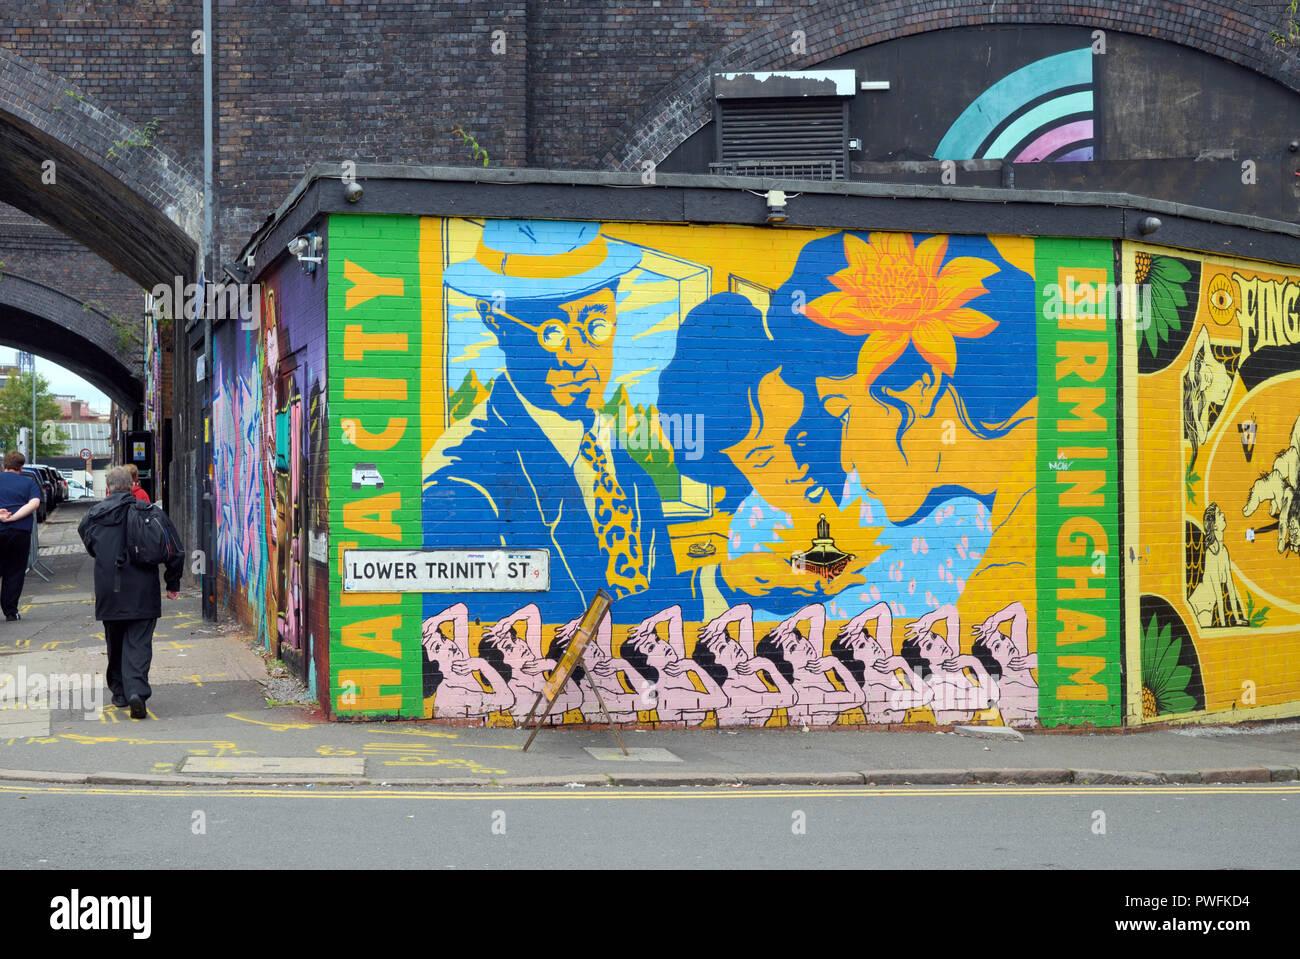 Pedestrian Walks Past Street Art in the Run-down Inner City Streets of Digbeth Birmingham England - Stock Image